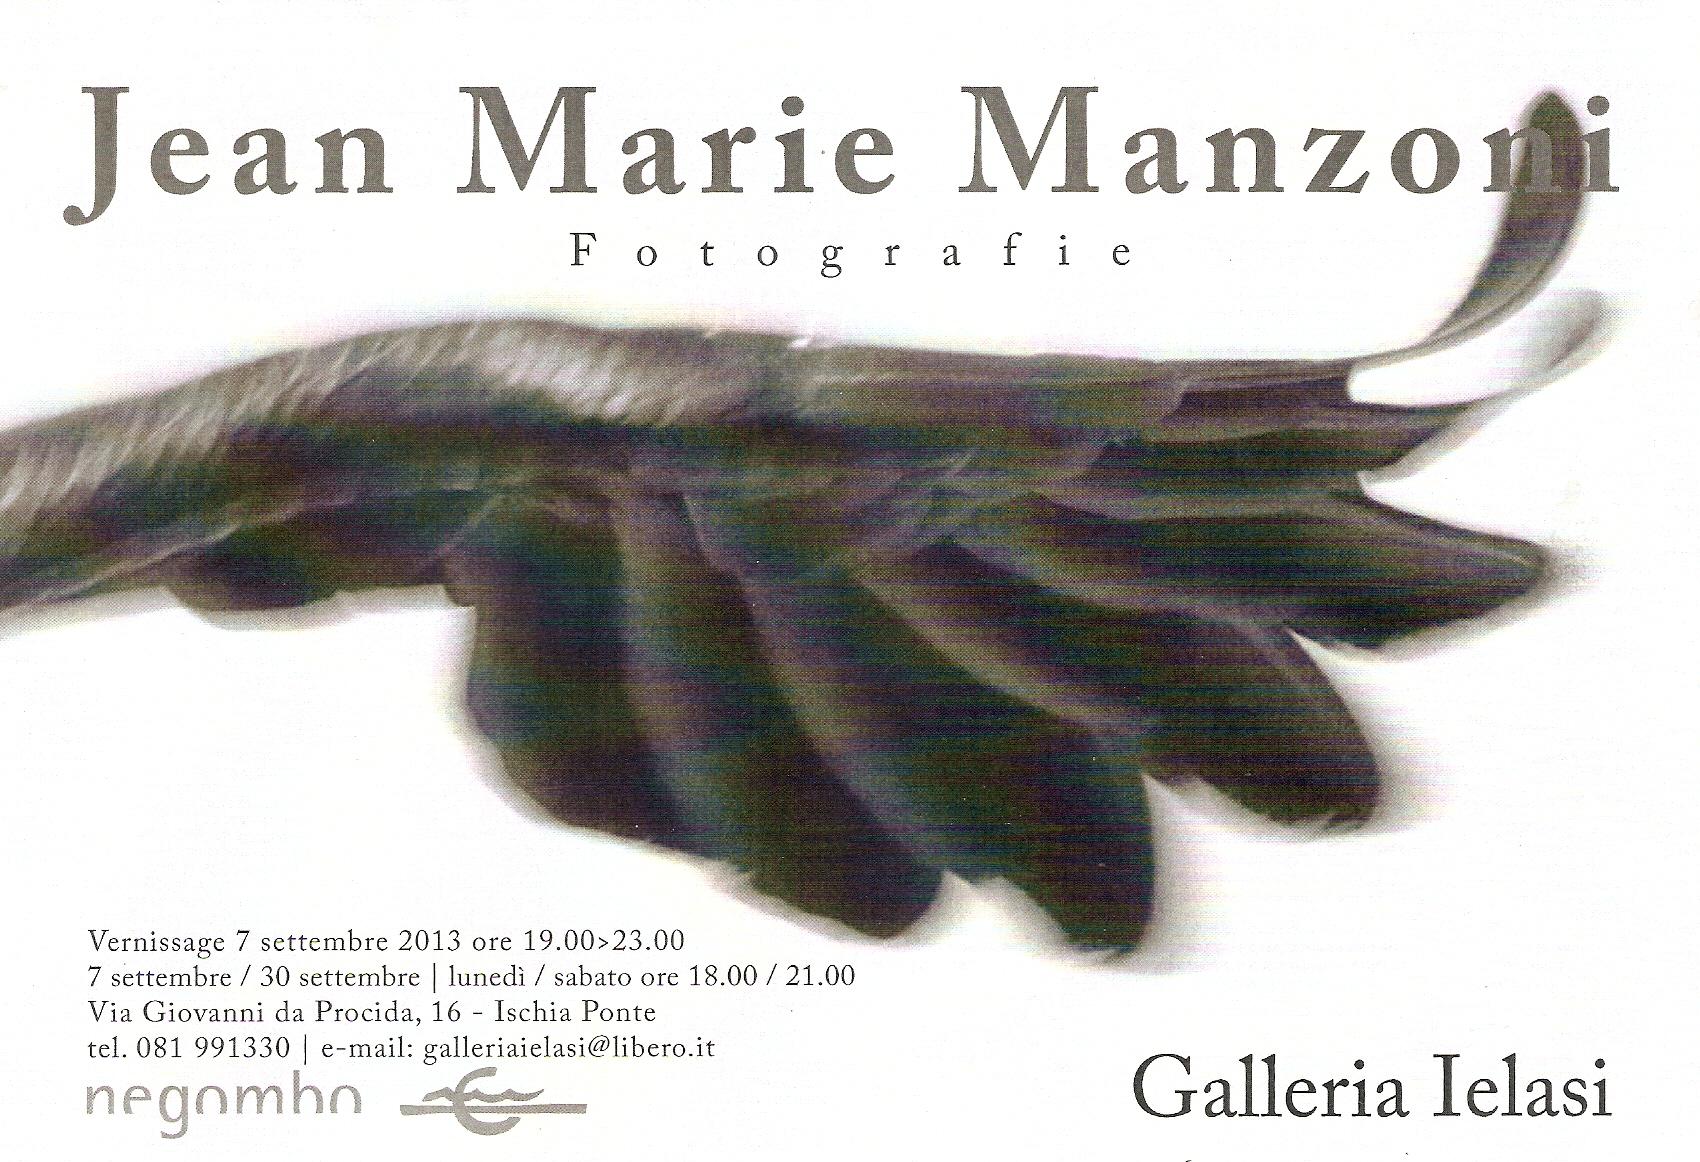 2013-09-07 Jean-Marie Manzoni0001